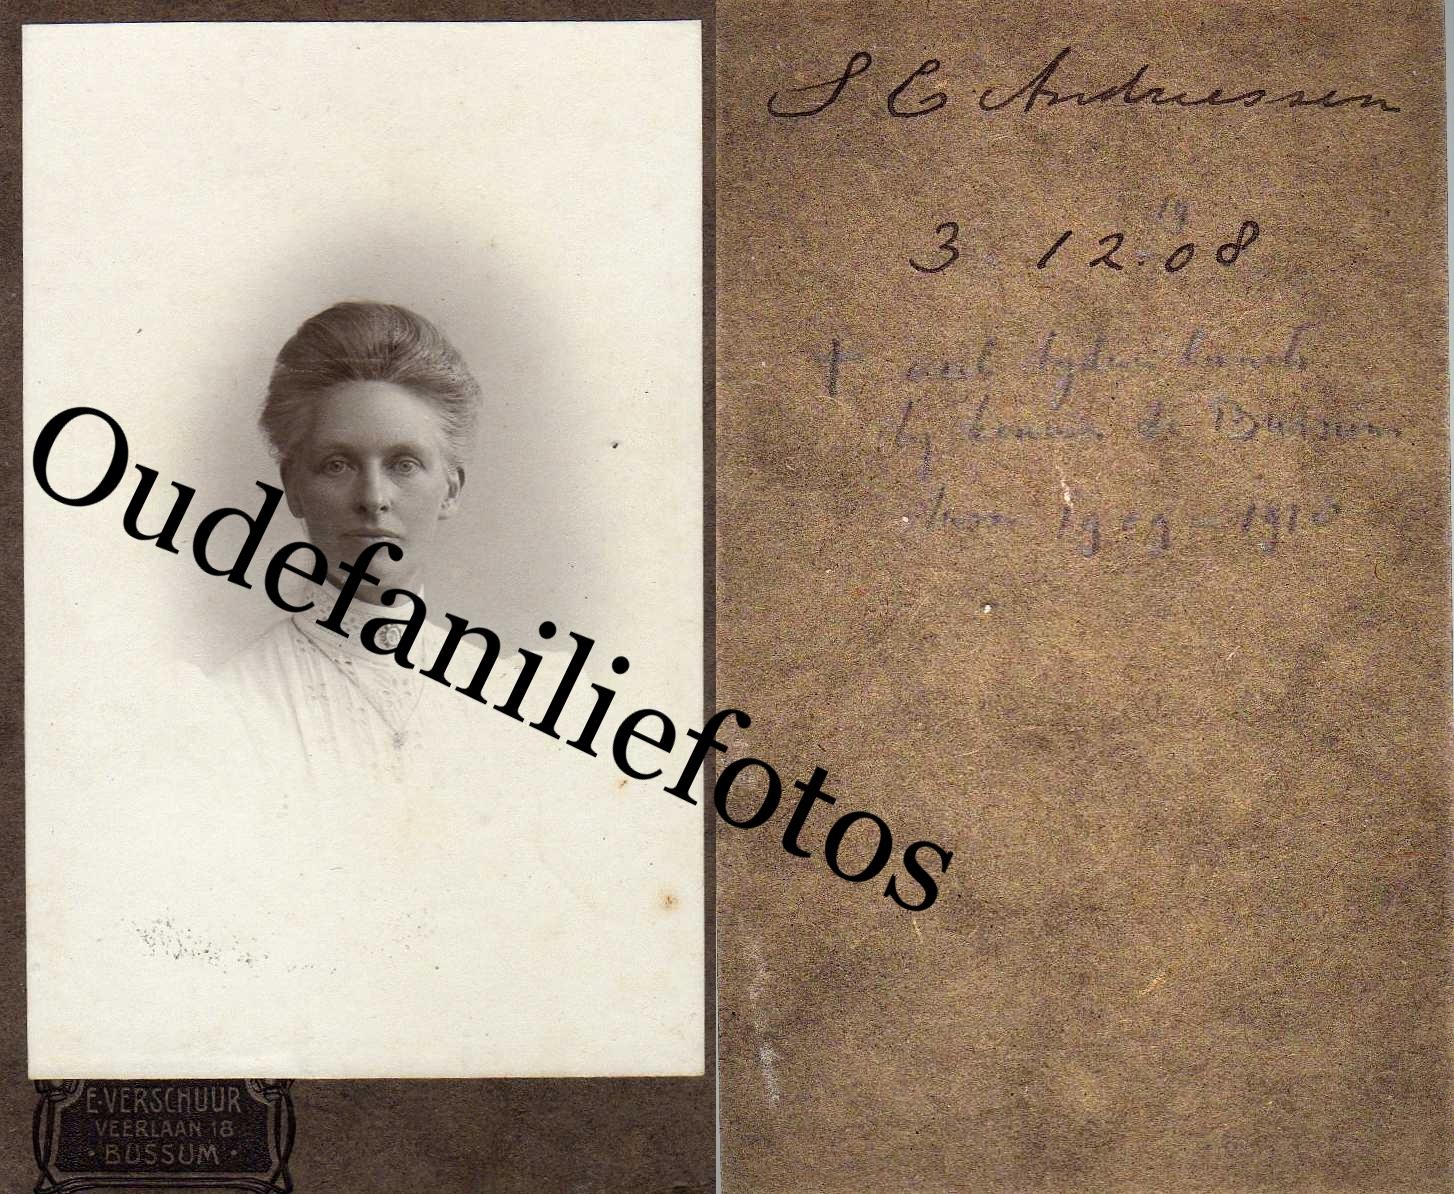 Andriessen, Suzanna Catharina. Geb. 7-1-1864 Zijpe ovl. 12-6-1913 Bussum. € 3,00